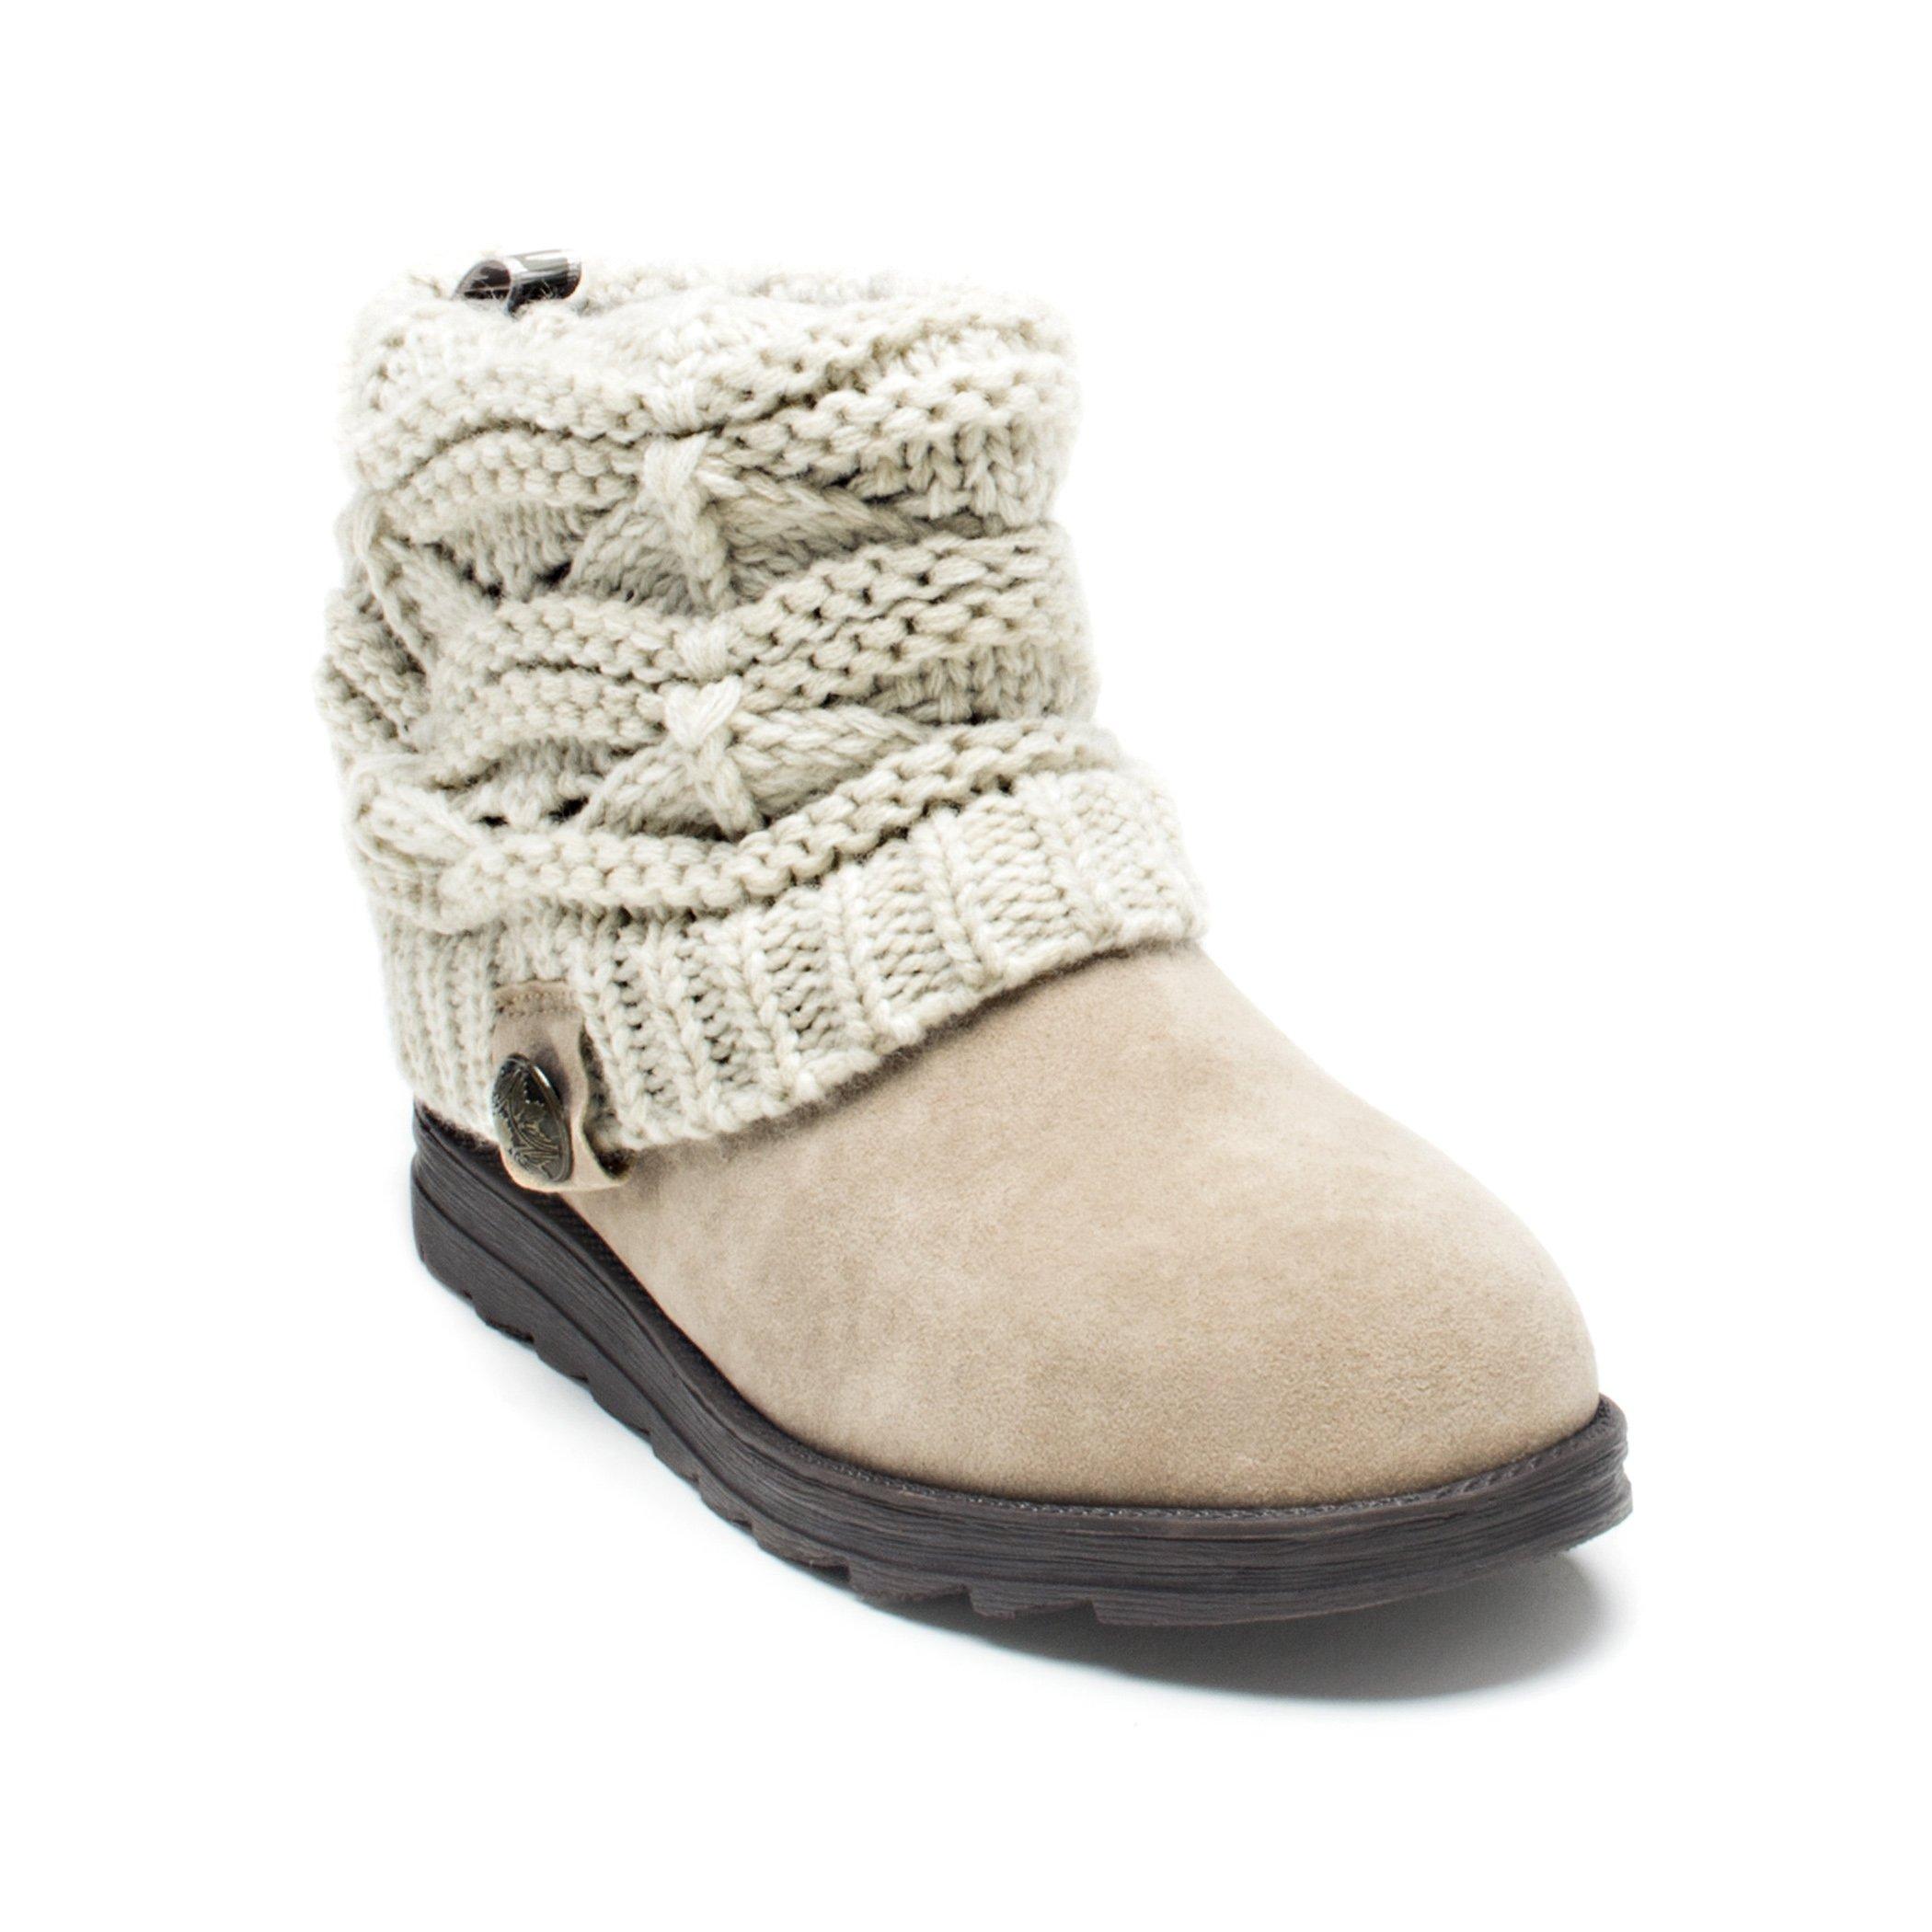 MUK LUKS Women's Patti Crochette Boot, Beige, 8 M US